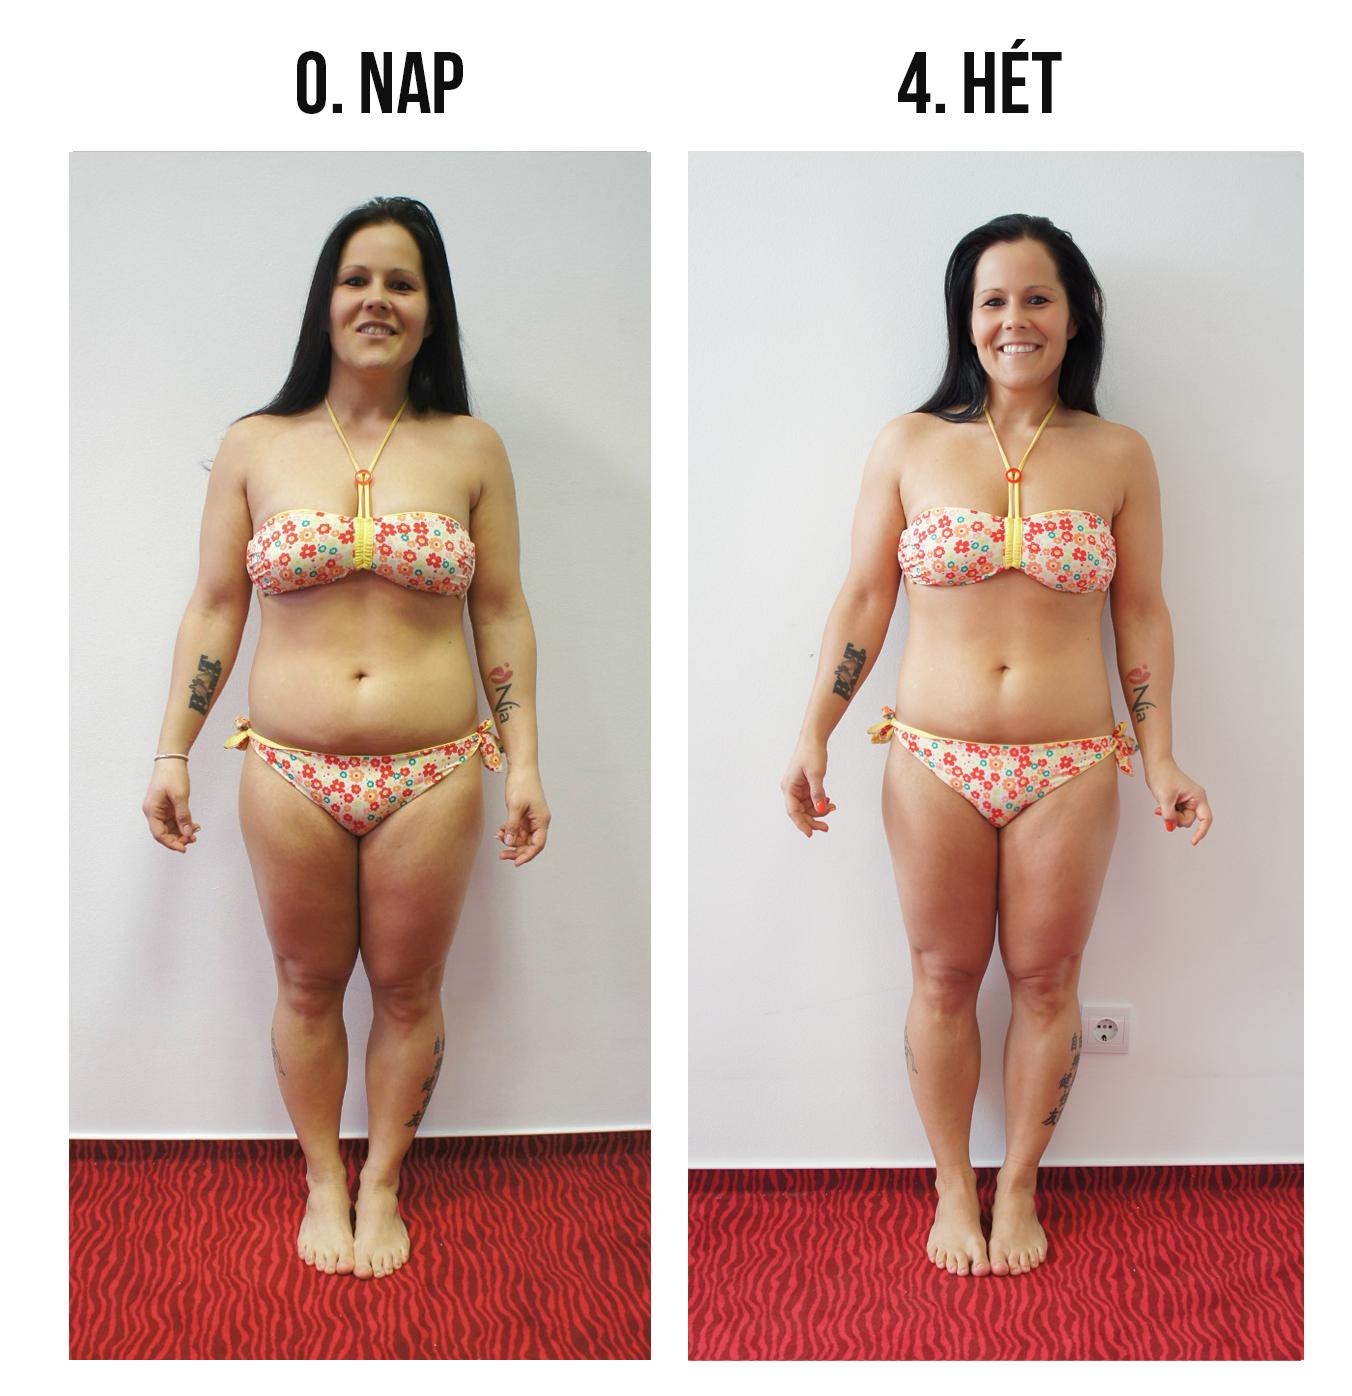 Égess zsírt zsírral! | Well&fit